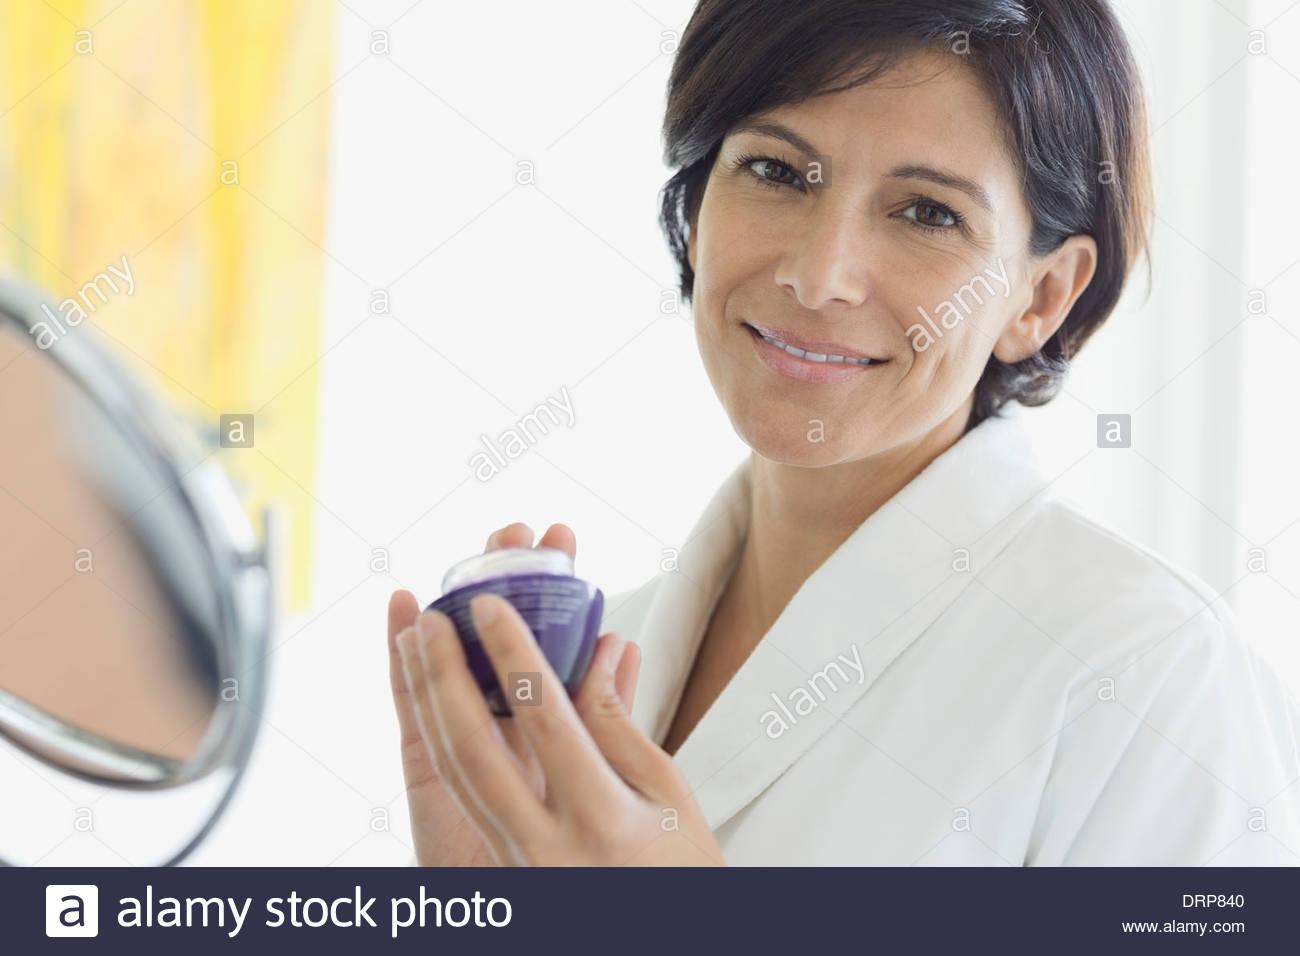 Woman holding eye cream in bathroom - Stock Image